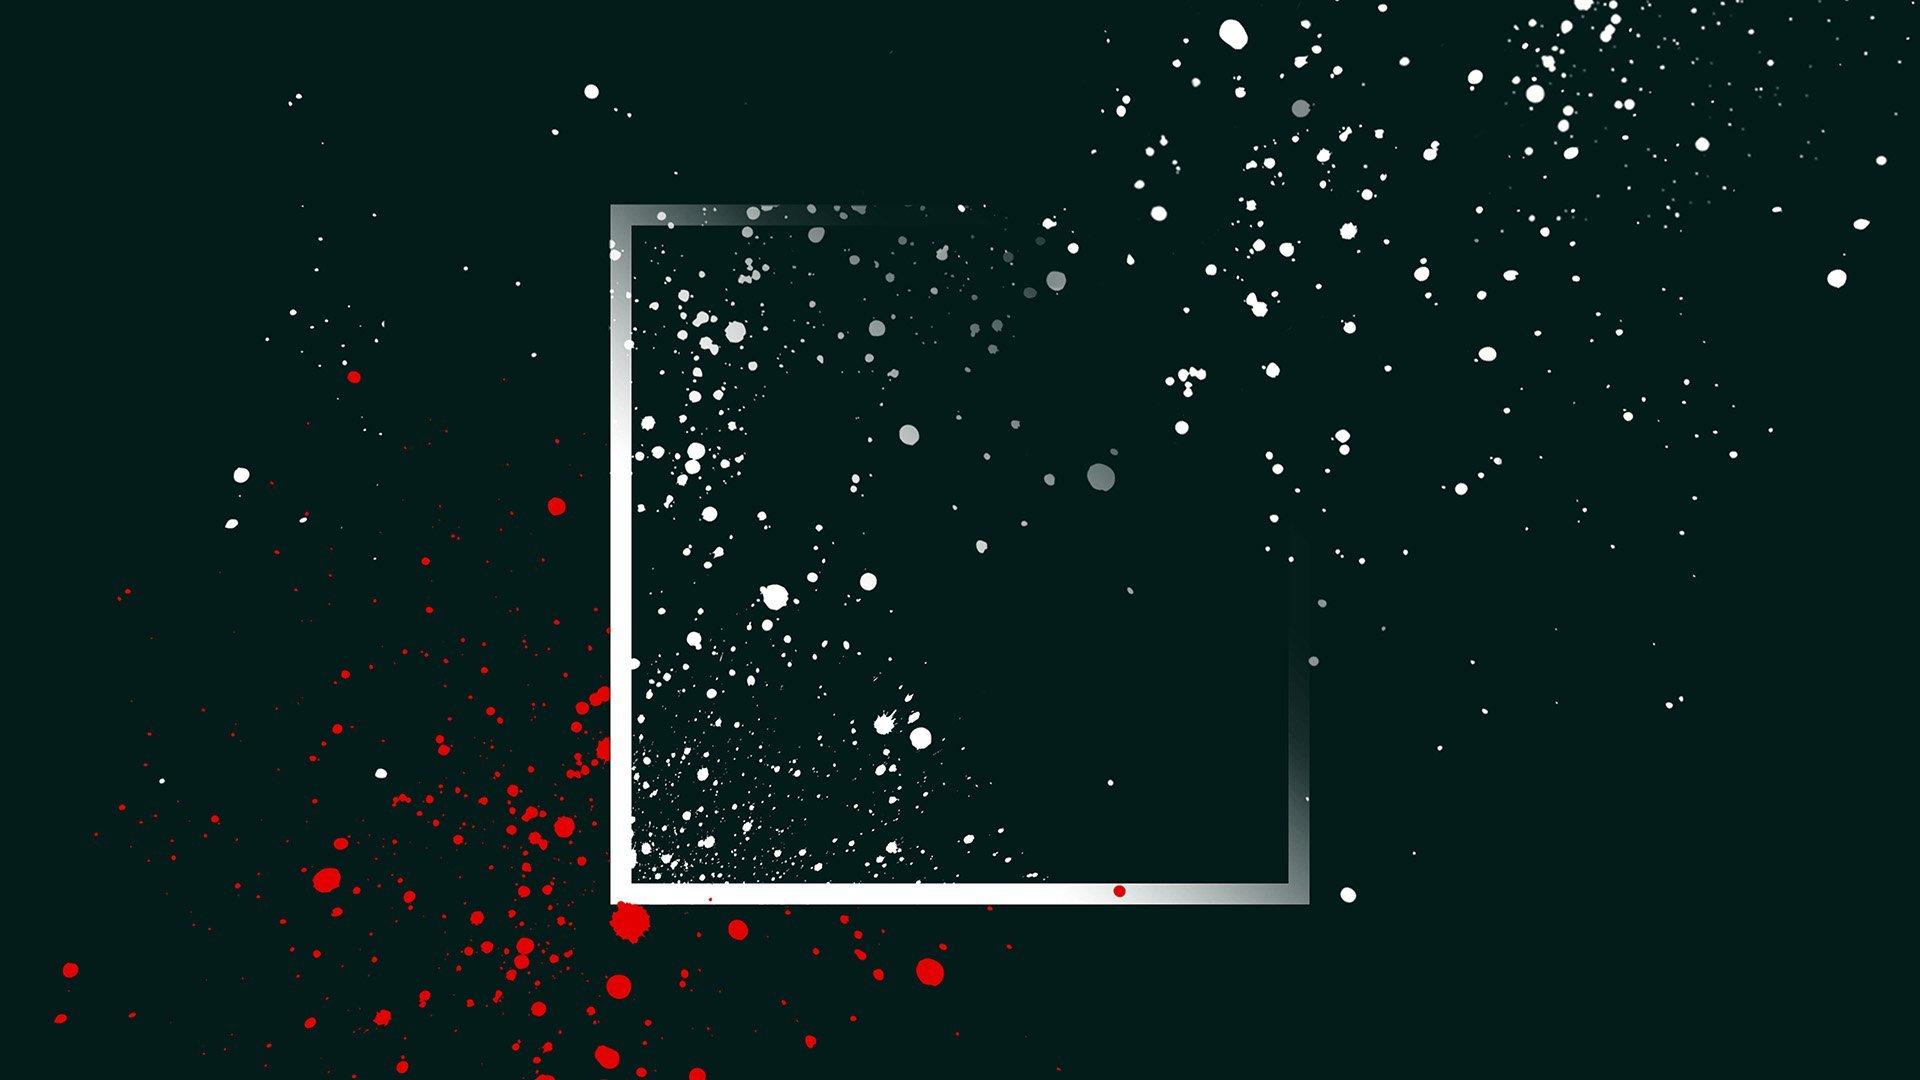 Wallpaper 1920x1080 Px Abstract Black Digital Art Dots